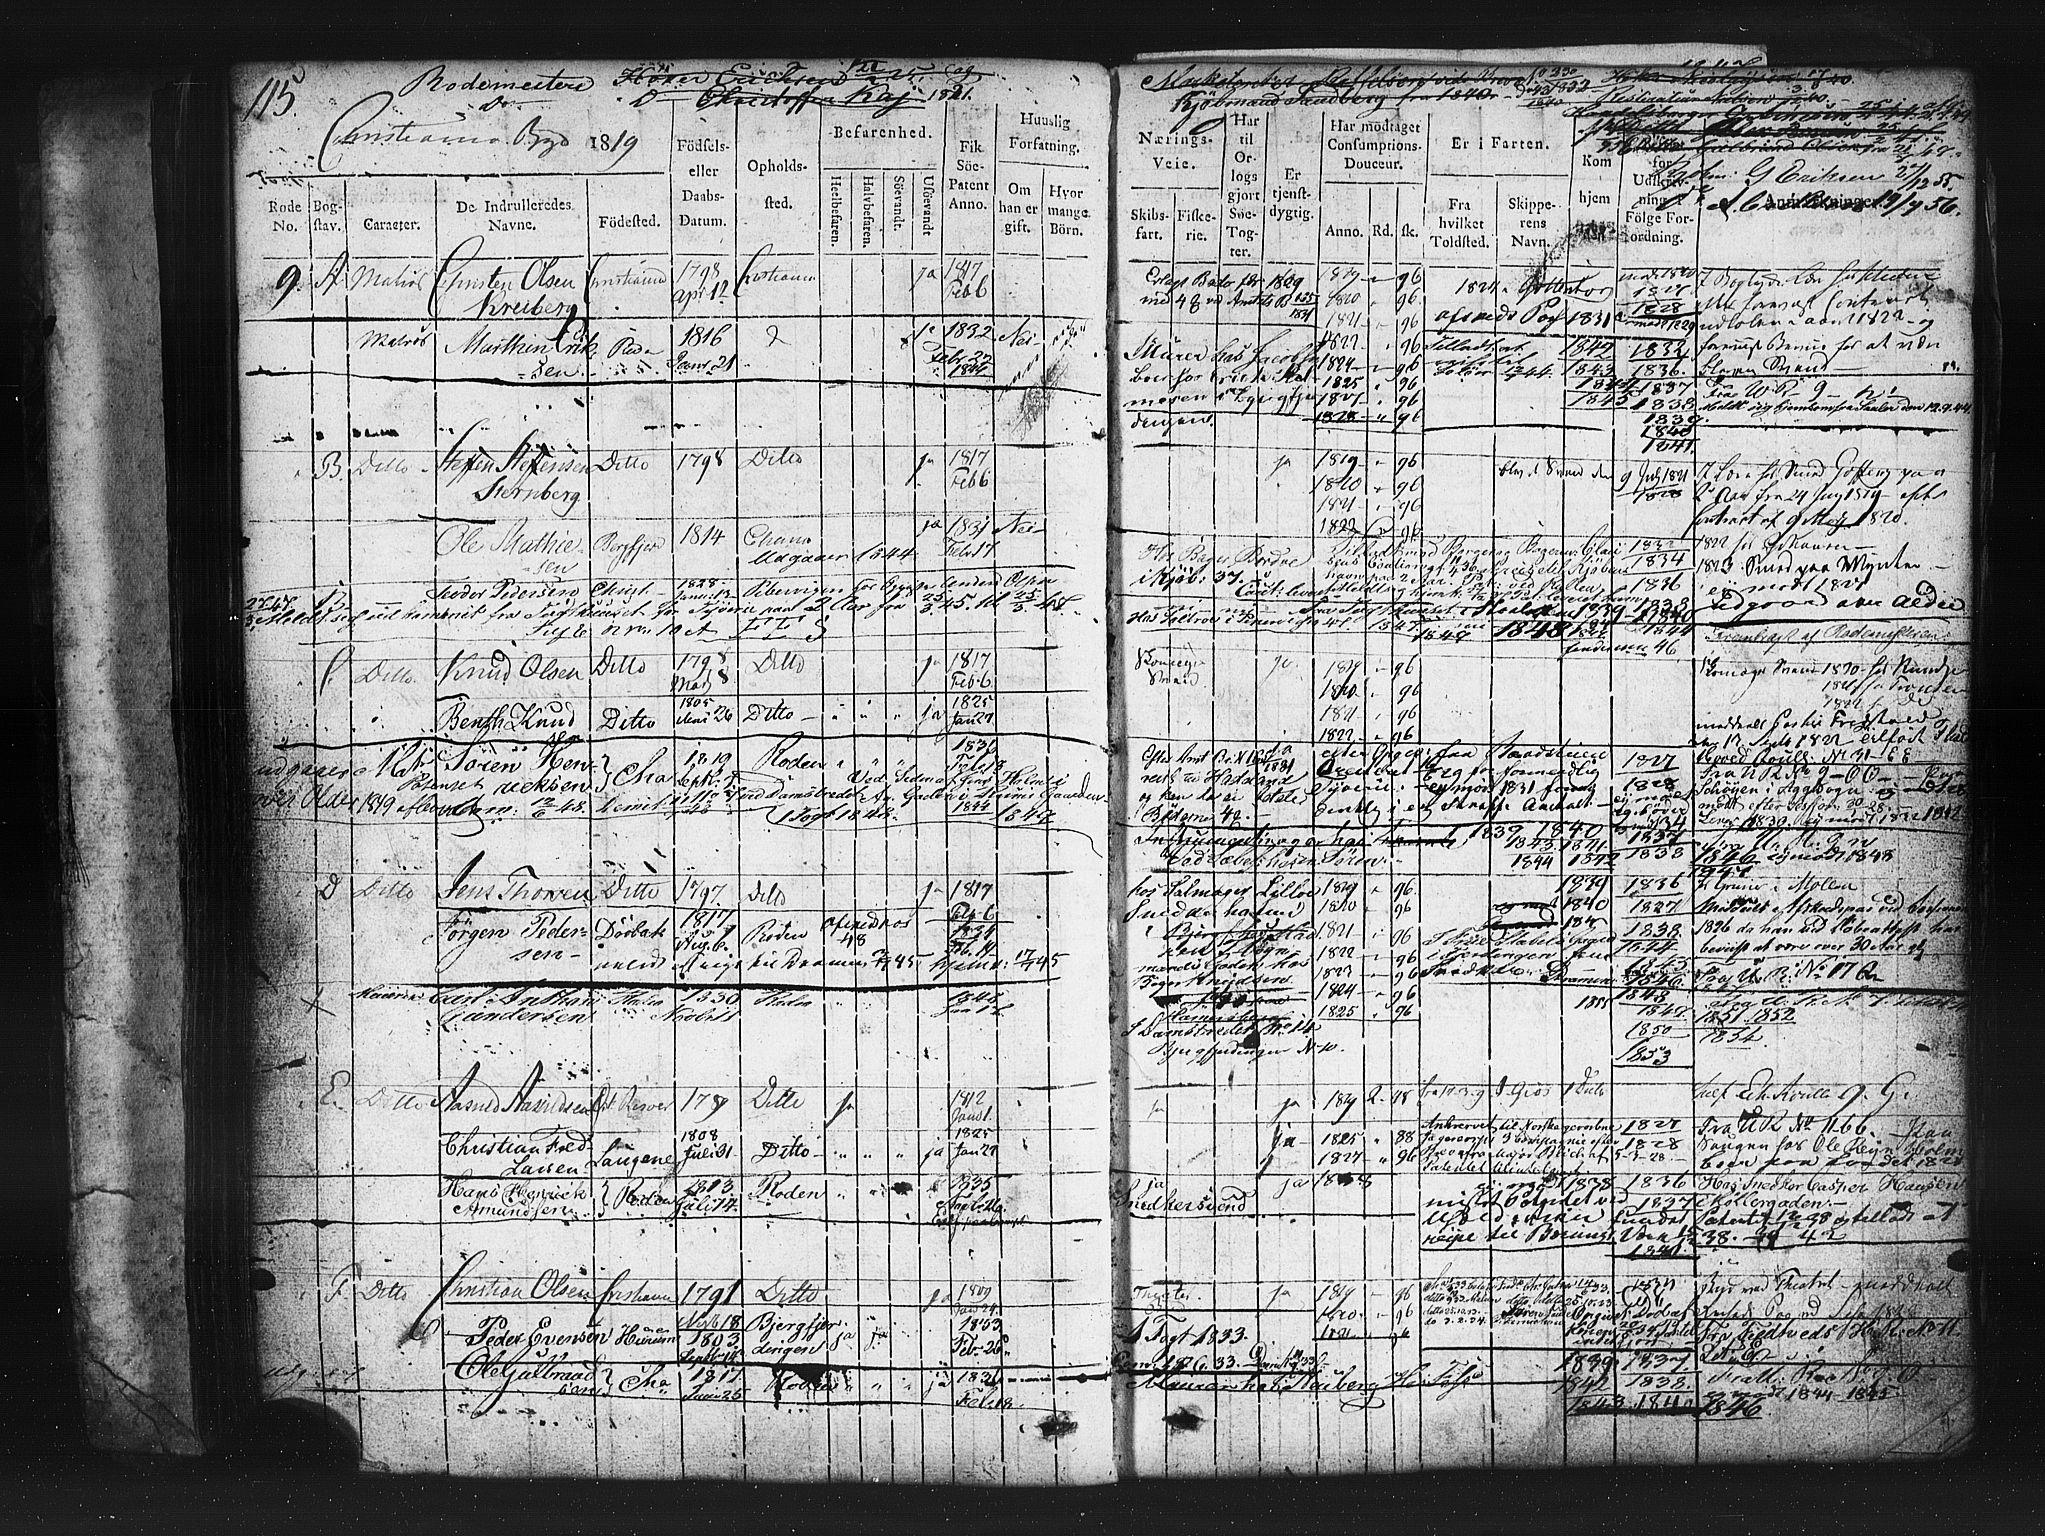 SAO, Oslo mønstringskontor, F/Fc/Fcb/L0001: Hovedrulle, 1819, s. 115